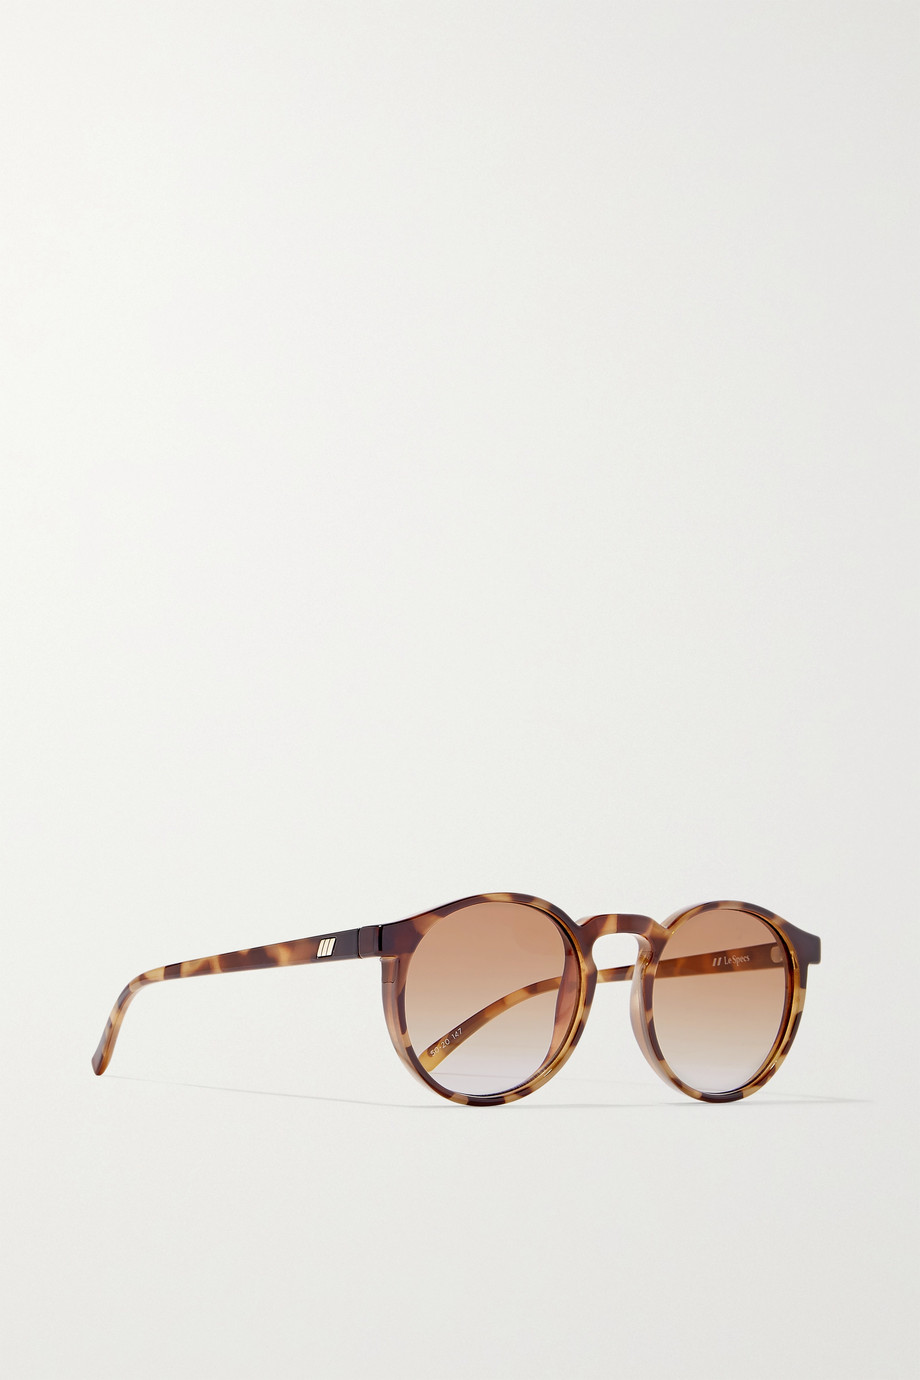 Le Specs Teen Spirit Deux round-frame tortoiseshell acetate sunglasses